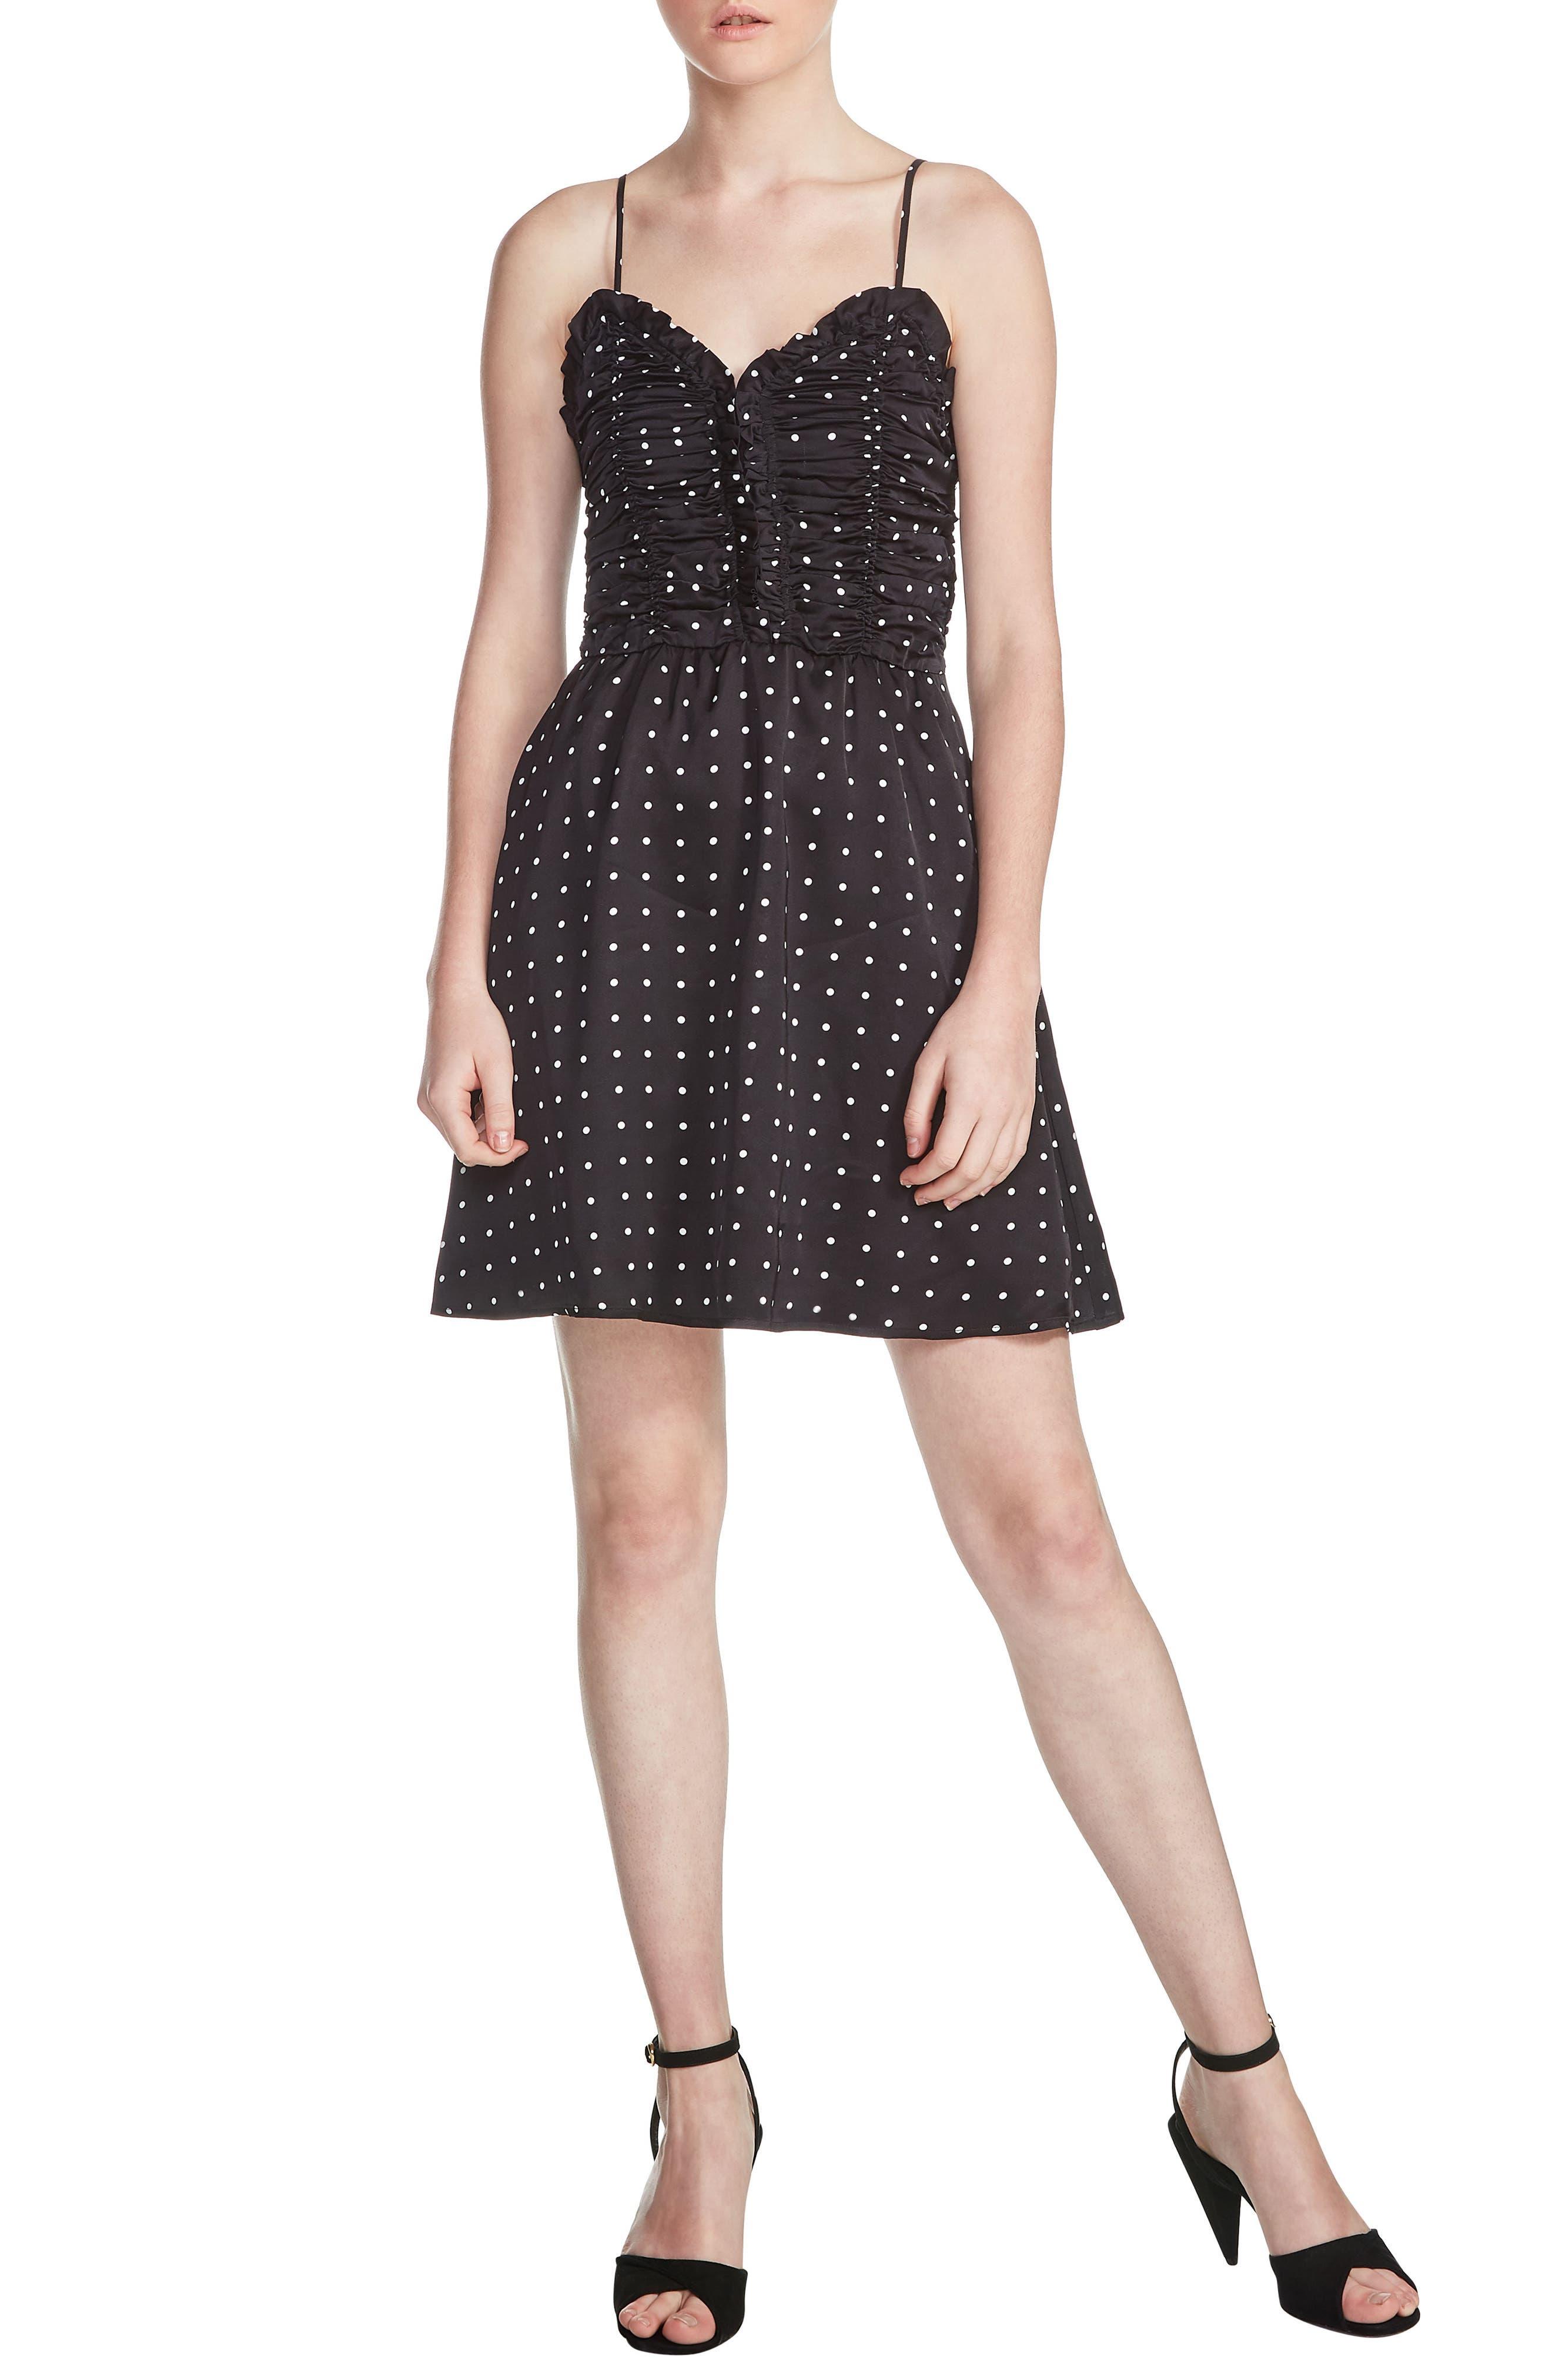 Renota Polka Dot Fit & Flare Dress,                         Main,                         color, 001